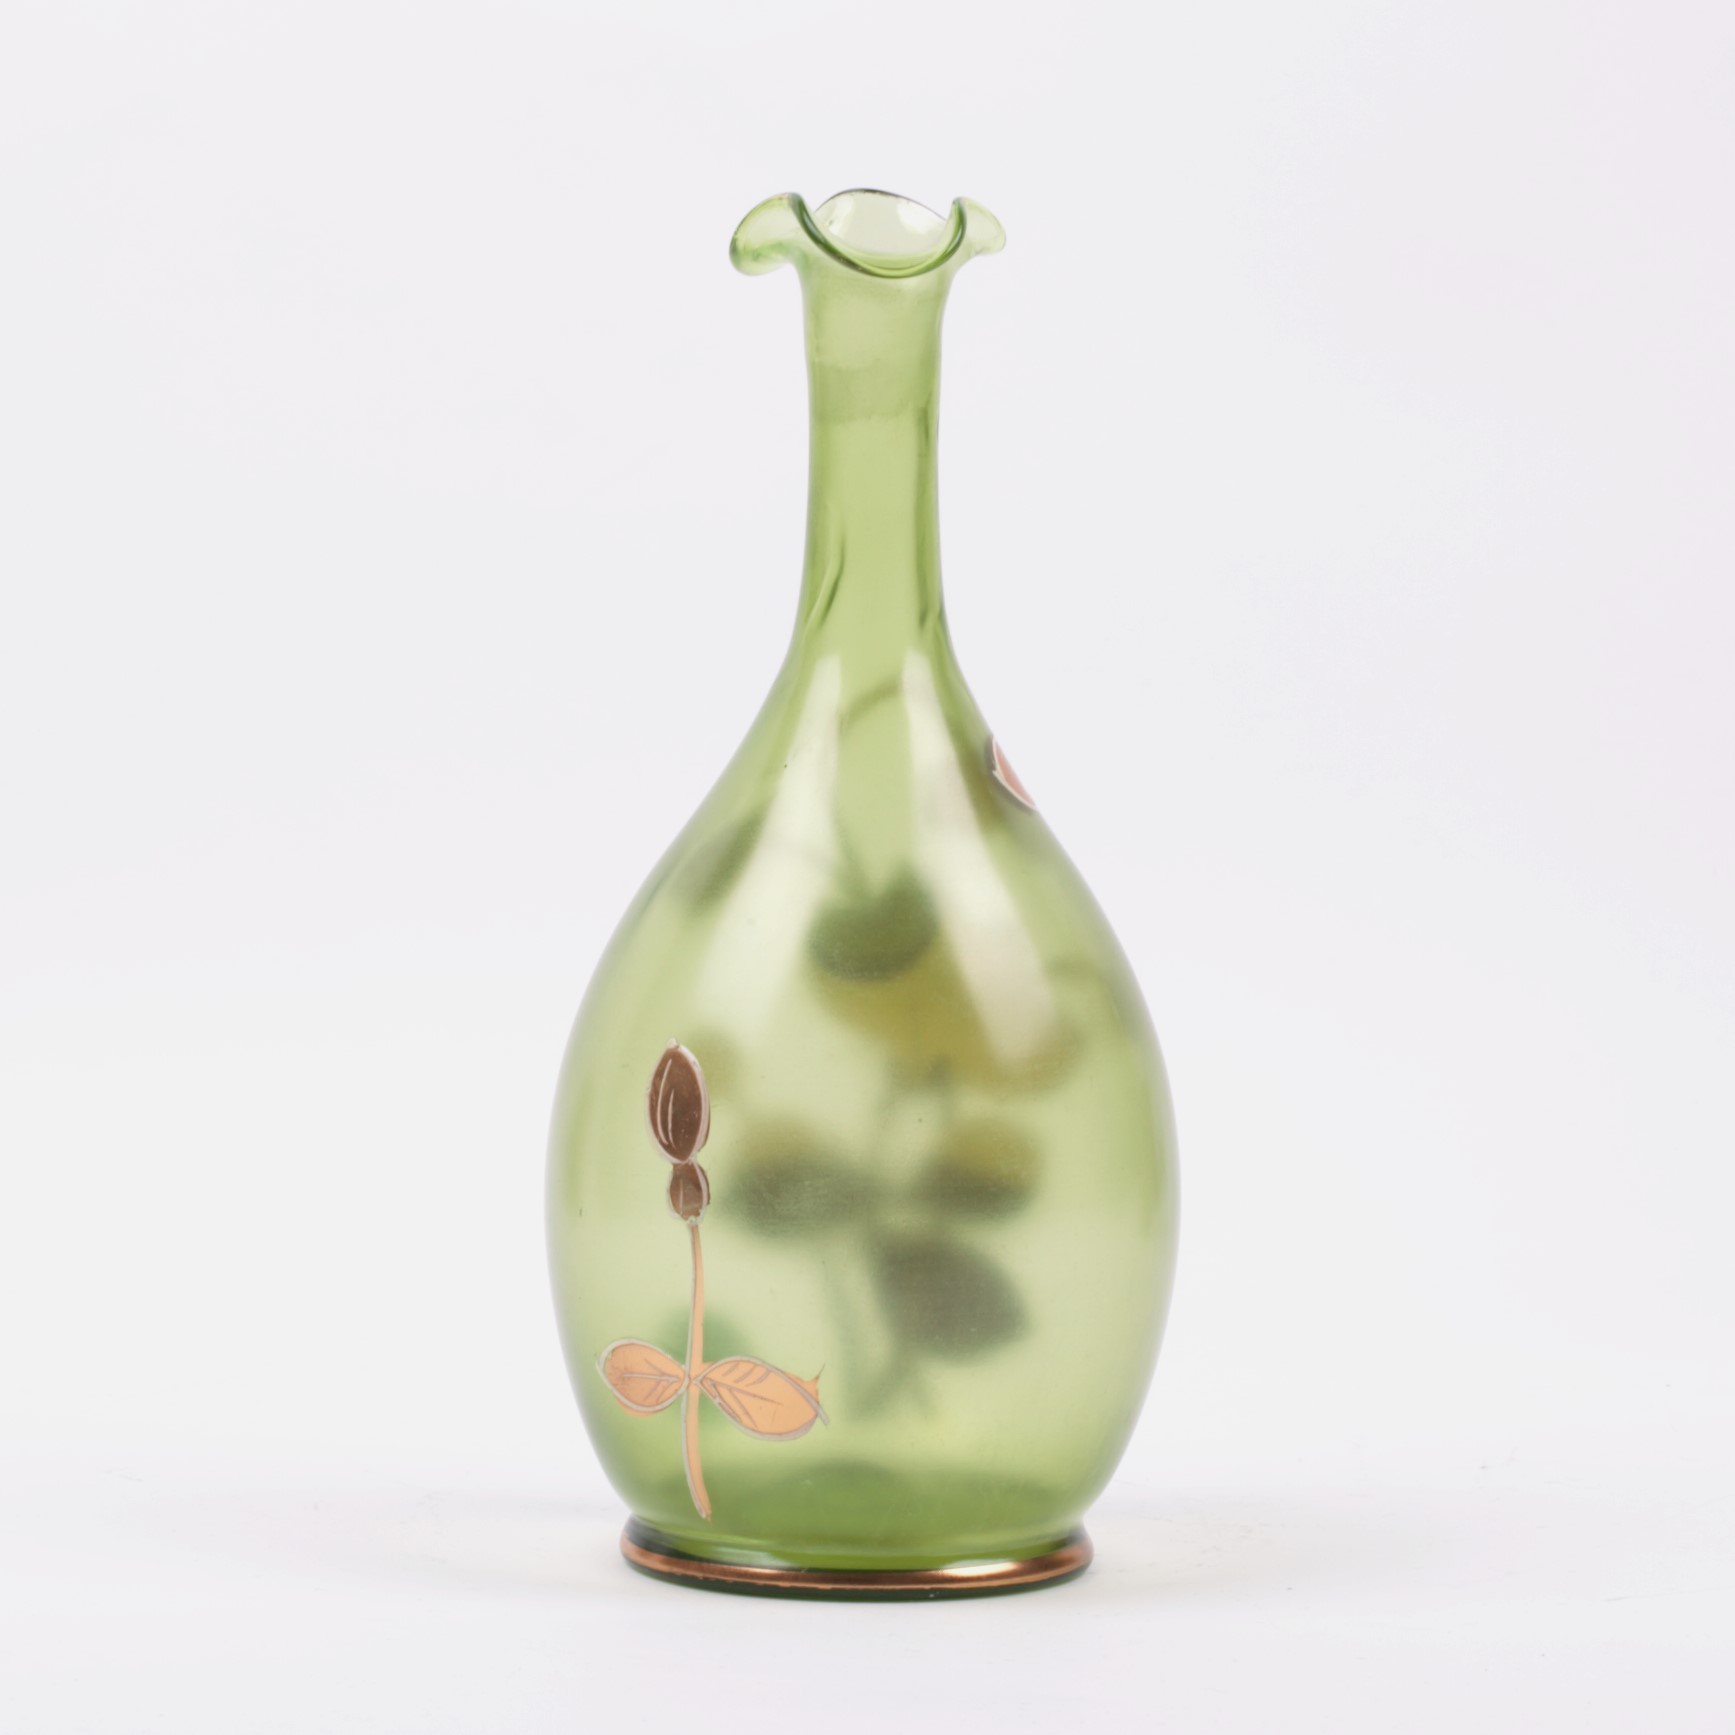 Antique green glass vase antique weapons collectibles silver antique green glass vase reviewsmspy